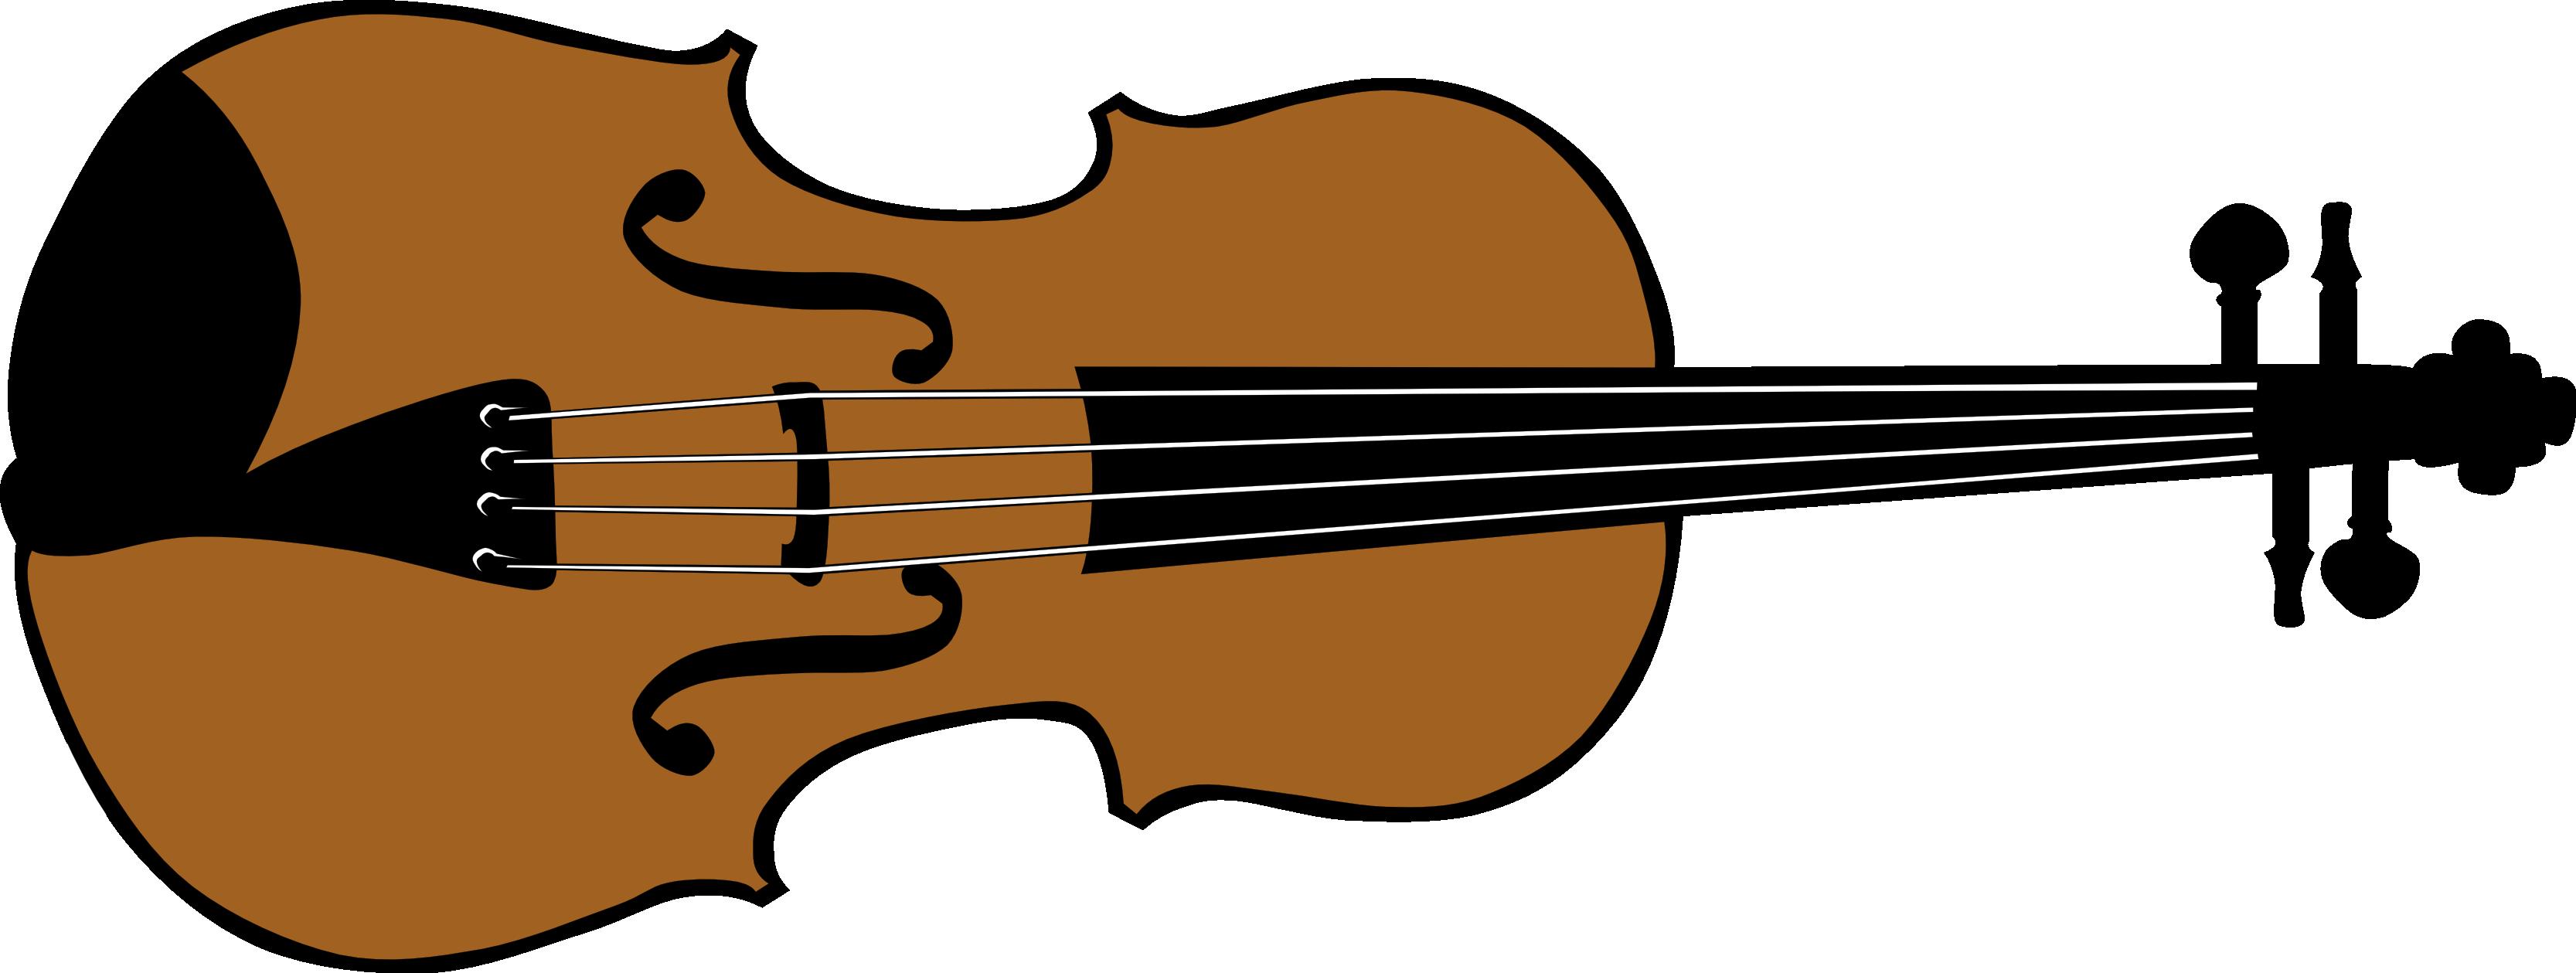 White Violin Drawing Violin 1 Black White Line